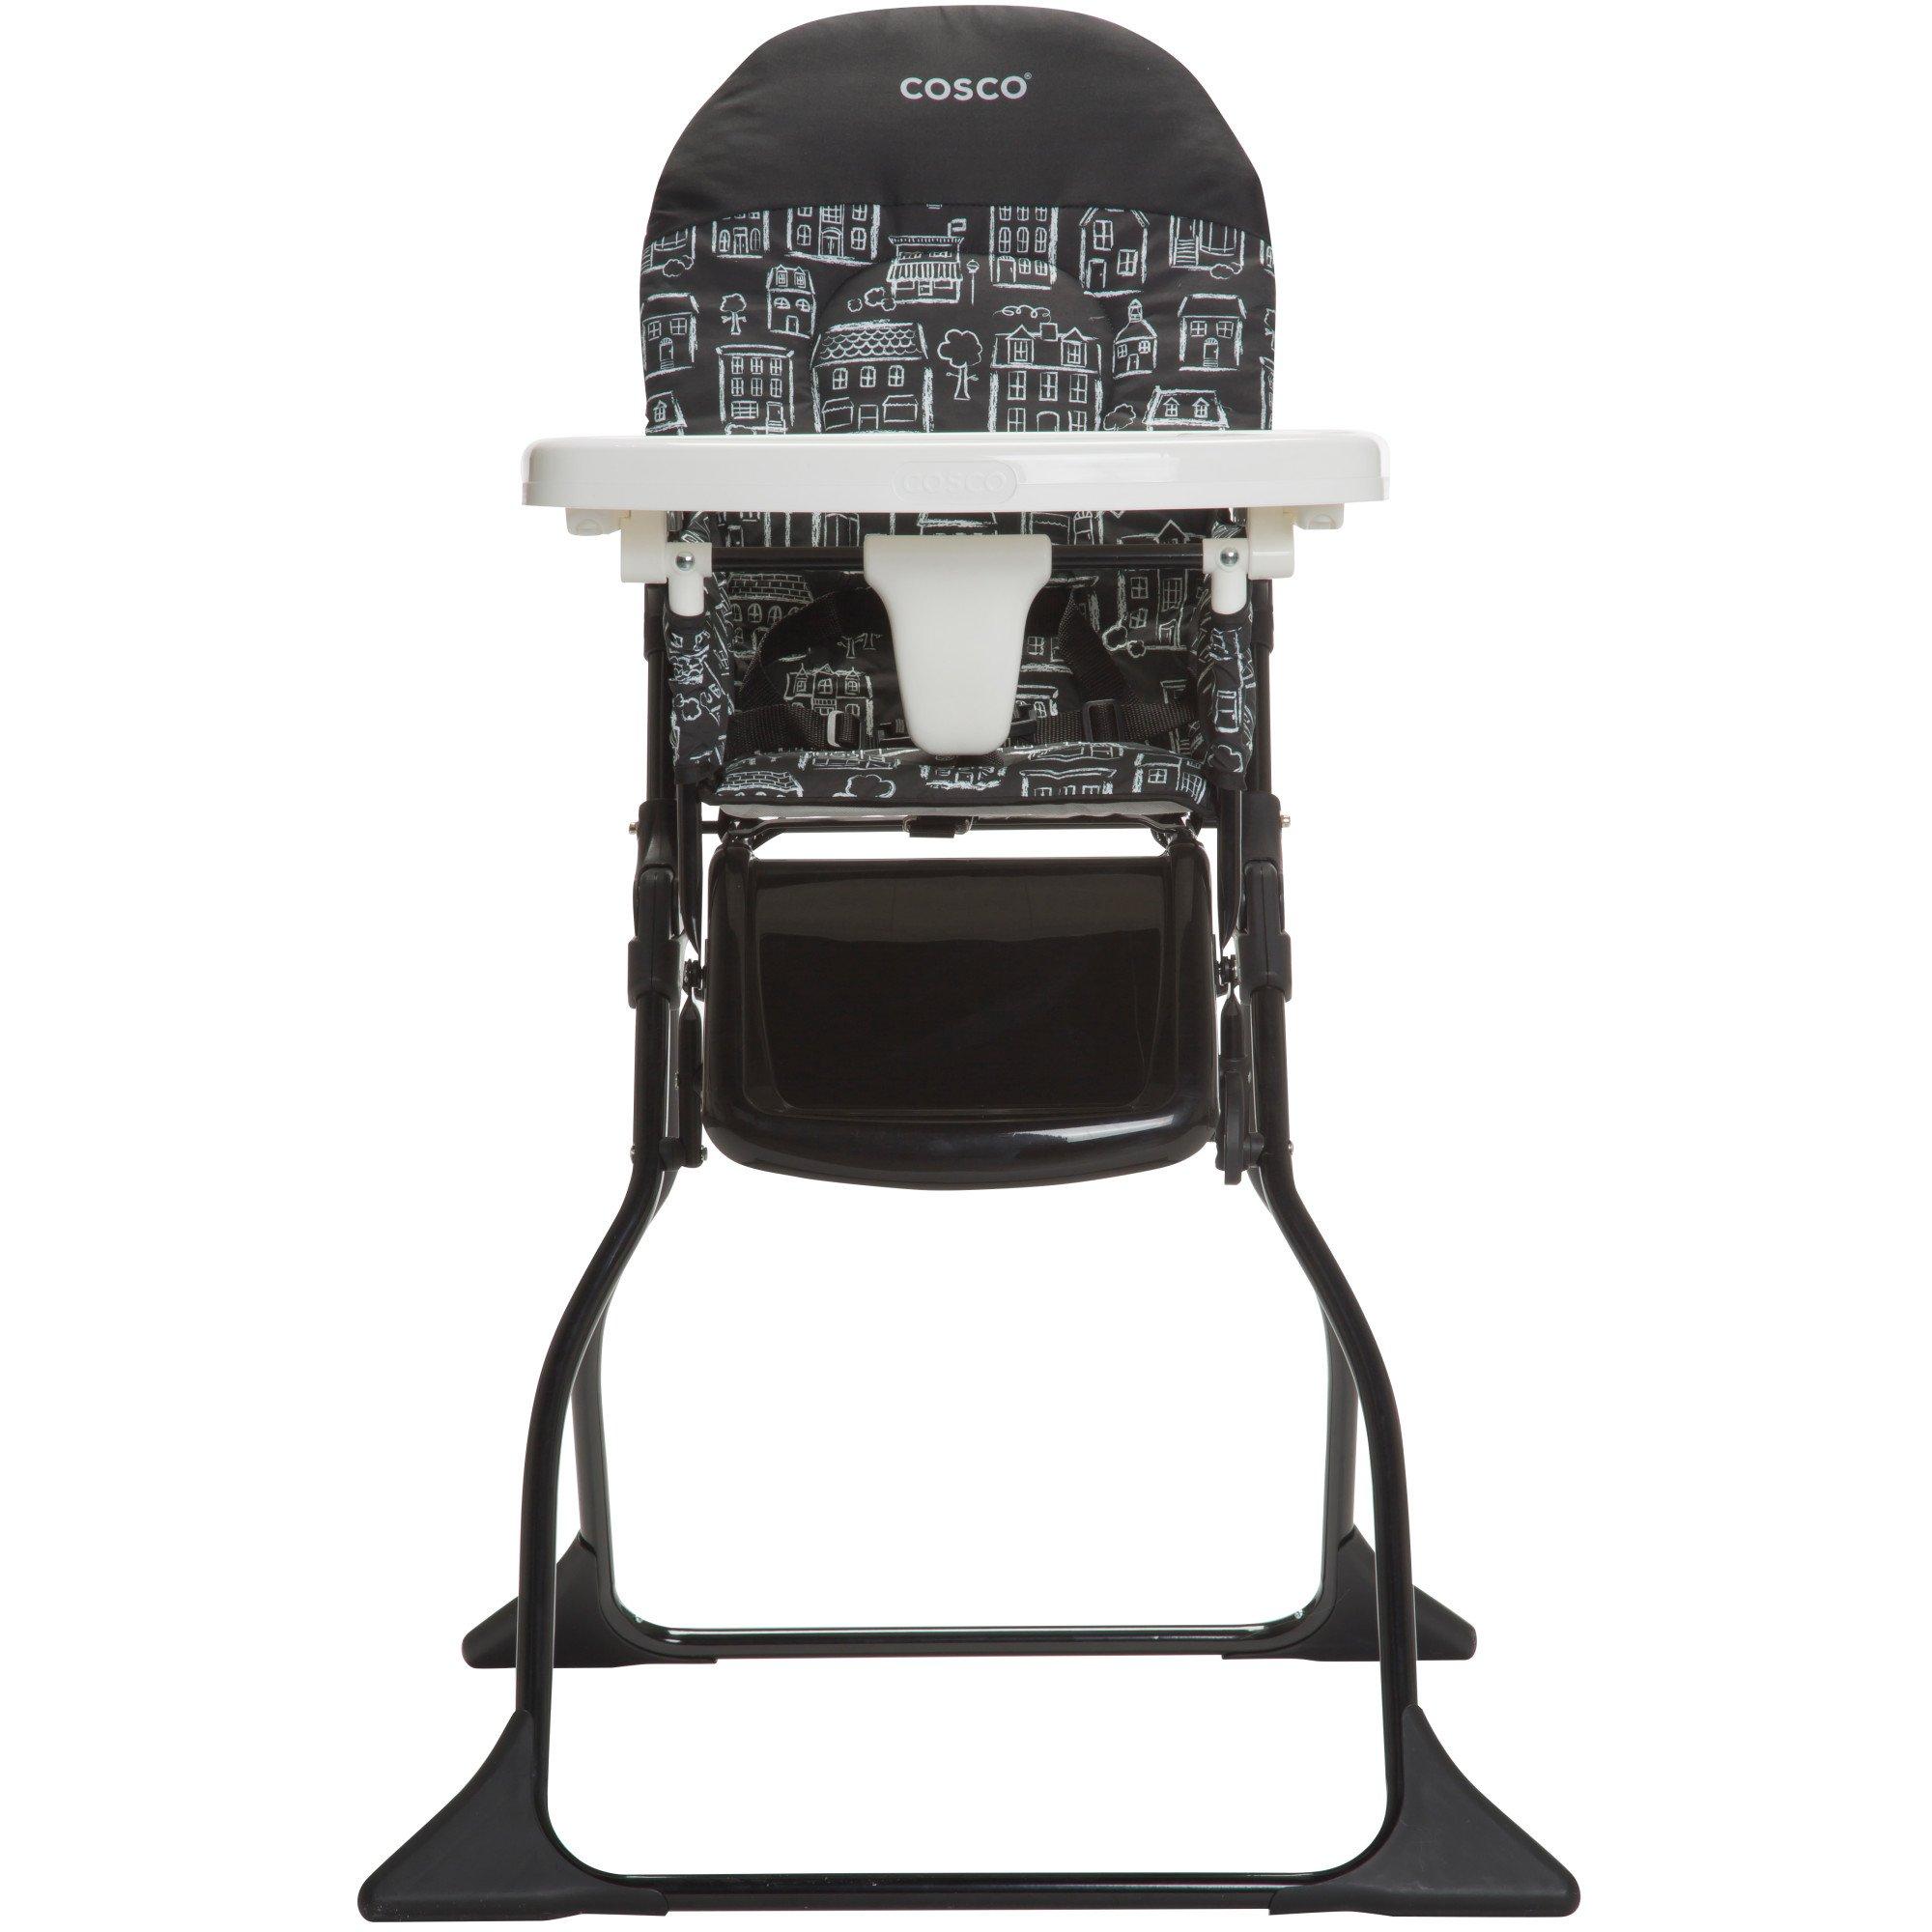 Sensational Cheap Fold Pp Chair Find Fold Pp Chair Deals On Line At Machost Co Dining Chair Design Ideas Machostcouk